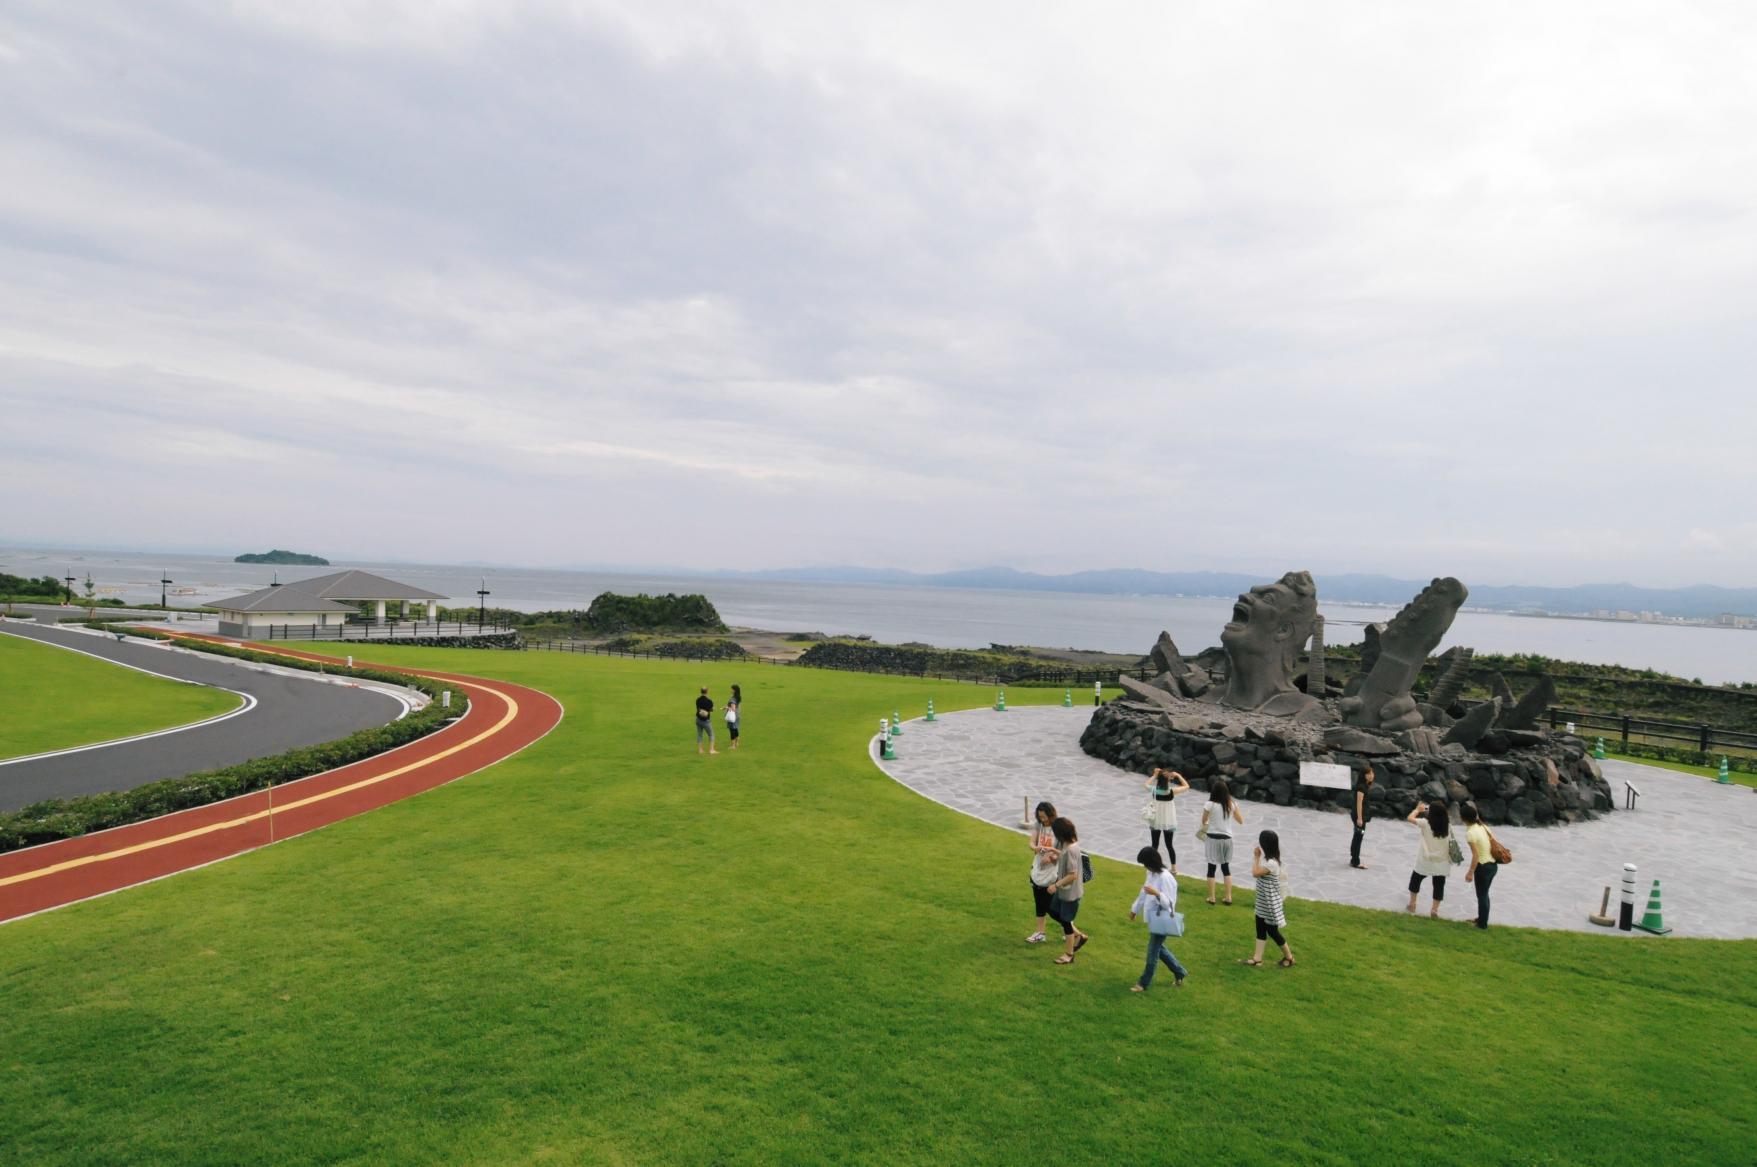 桜島イベント広場ゾーン(桜島赤水採石場跡地)-1